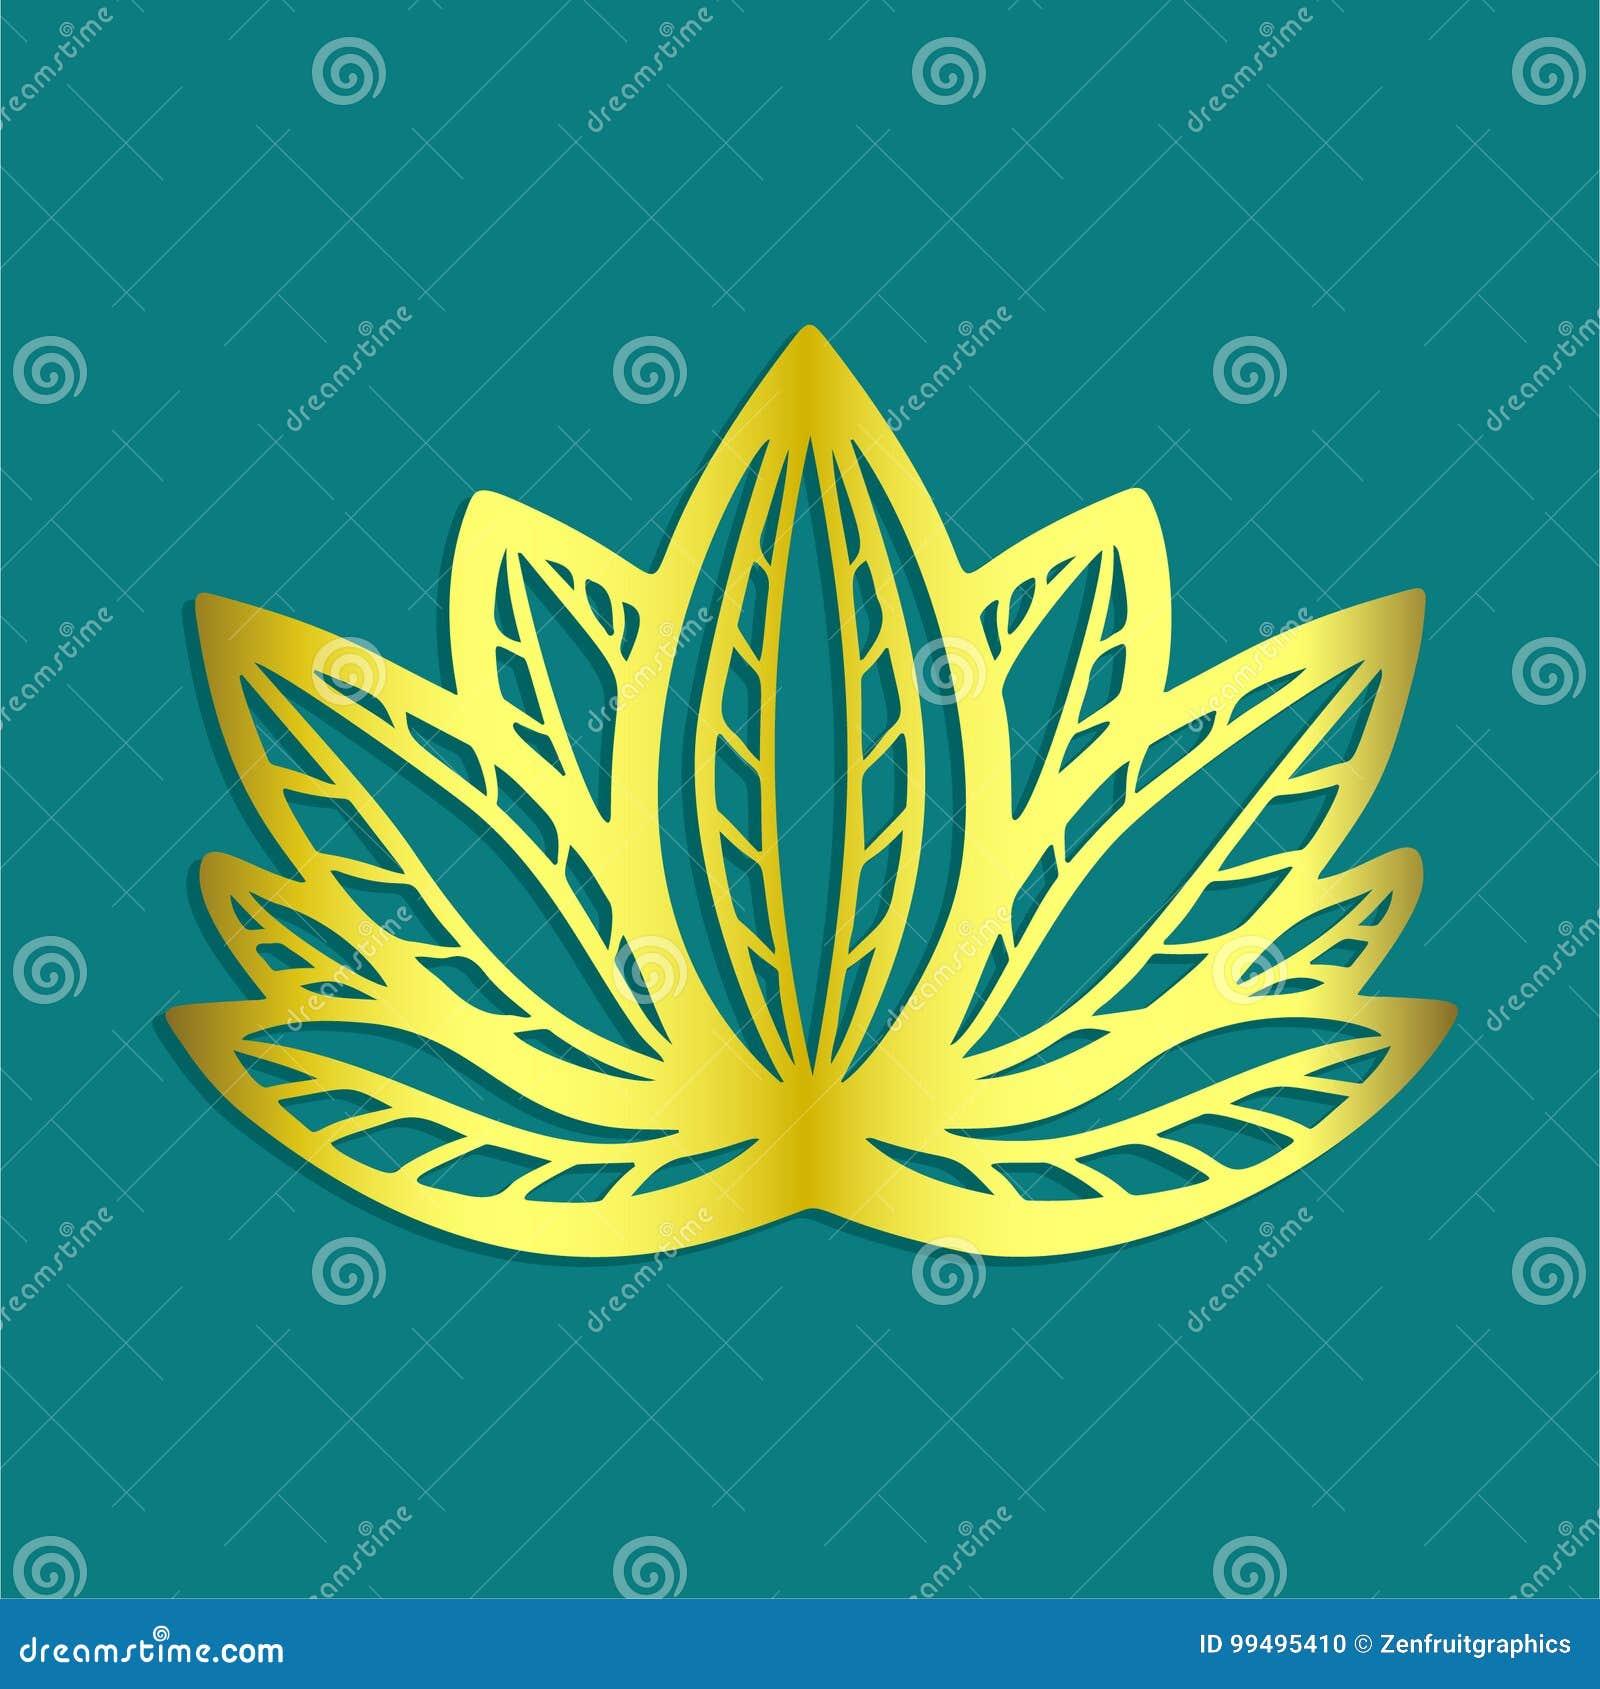 Stylized Golden Lotus Flower Logo On Blue Background Hand Drawn